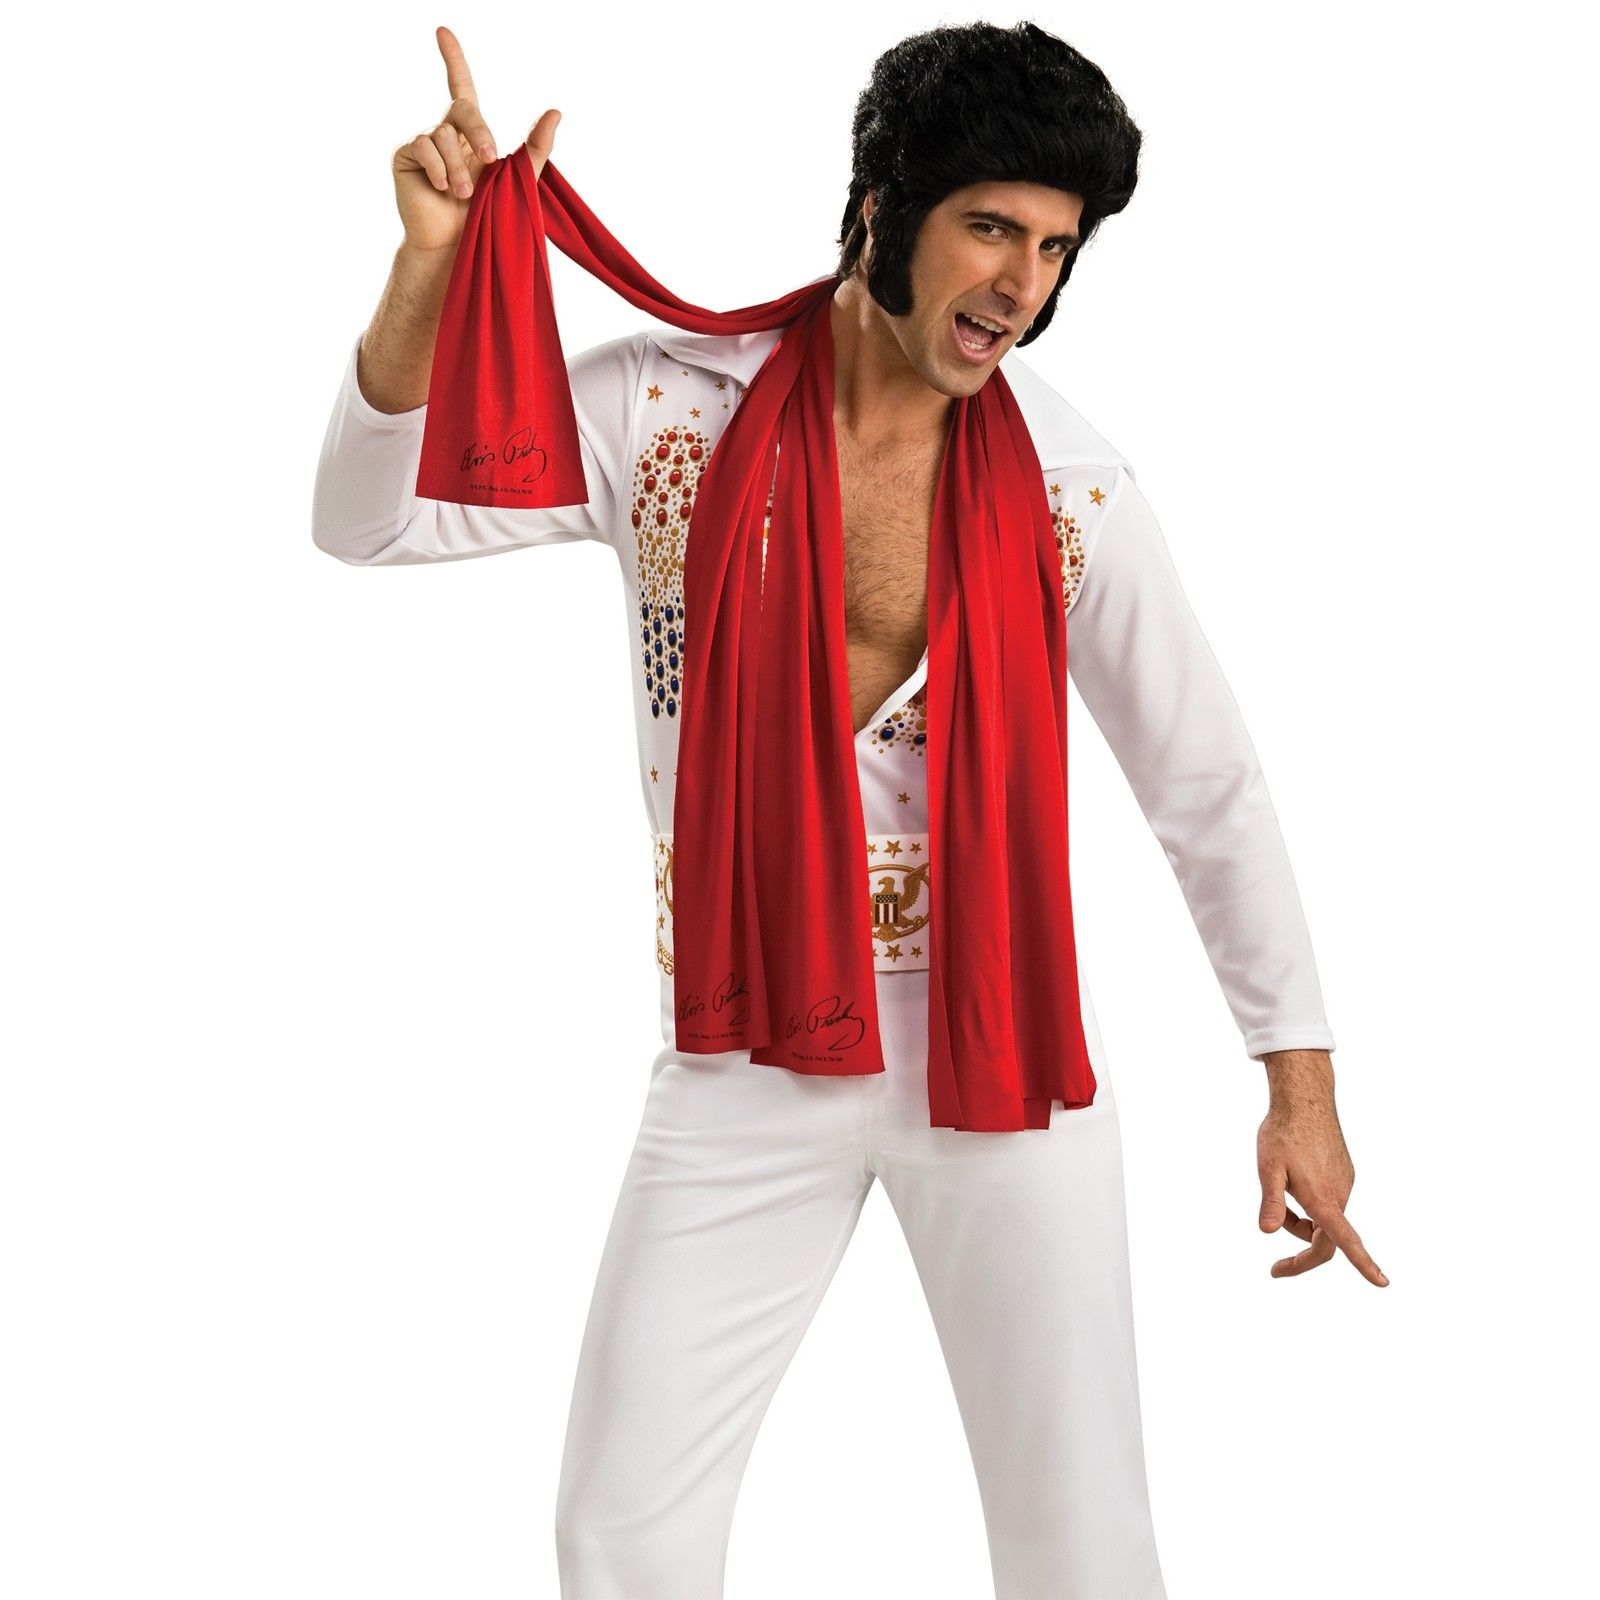 Elvis Presley Scarves Costume Accessories (3 Pieces